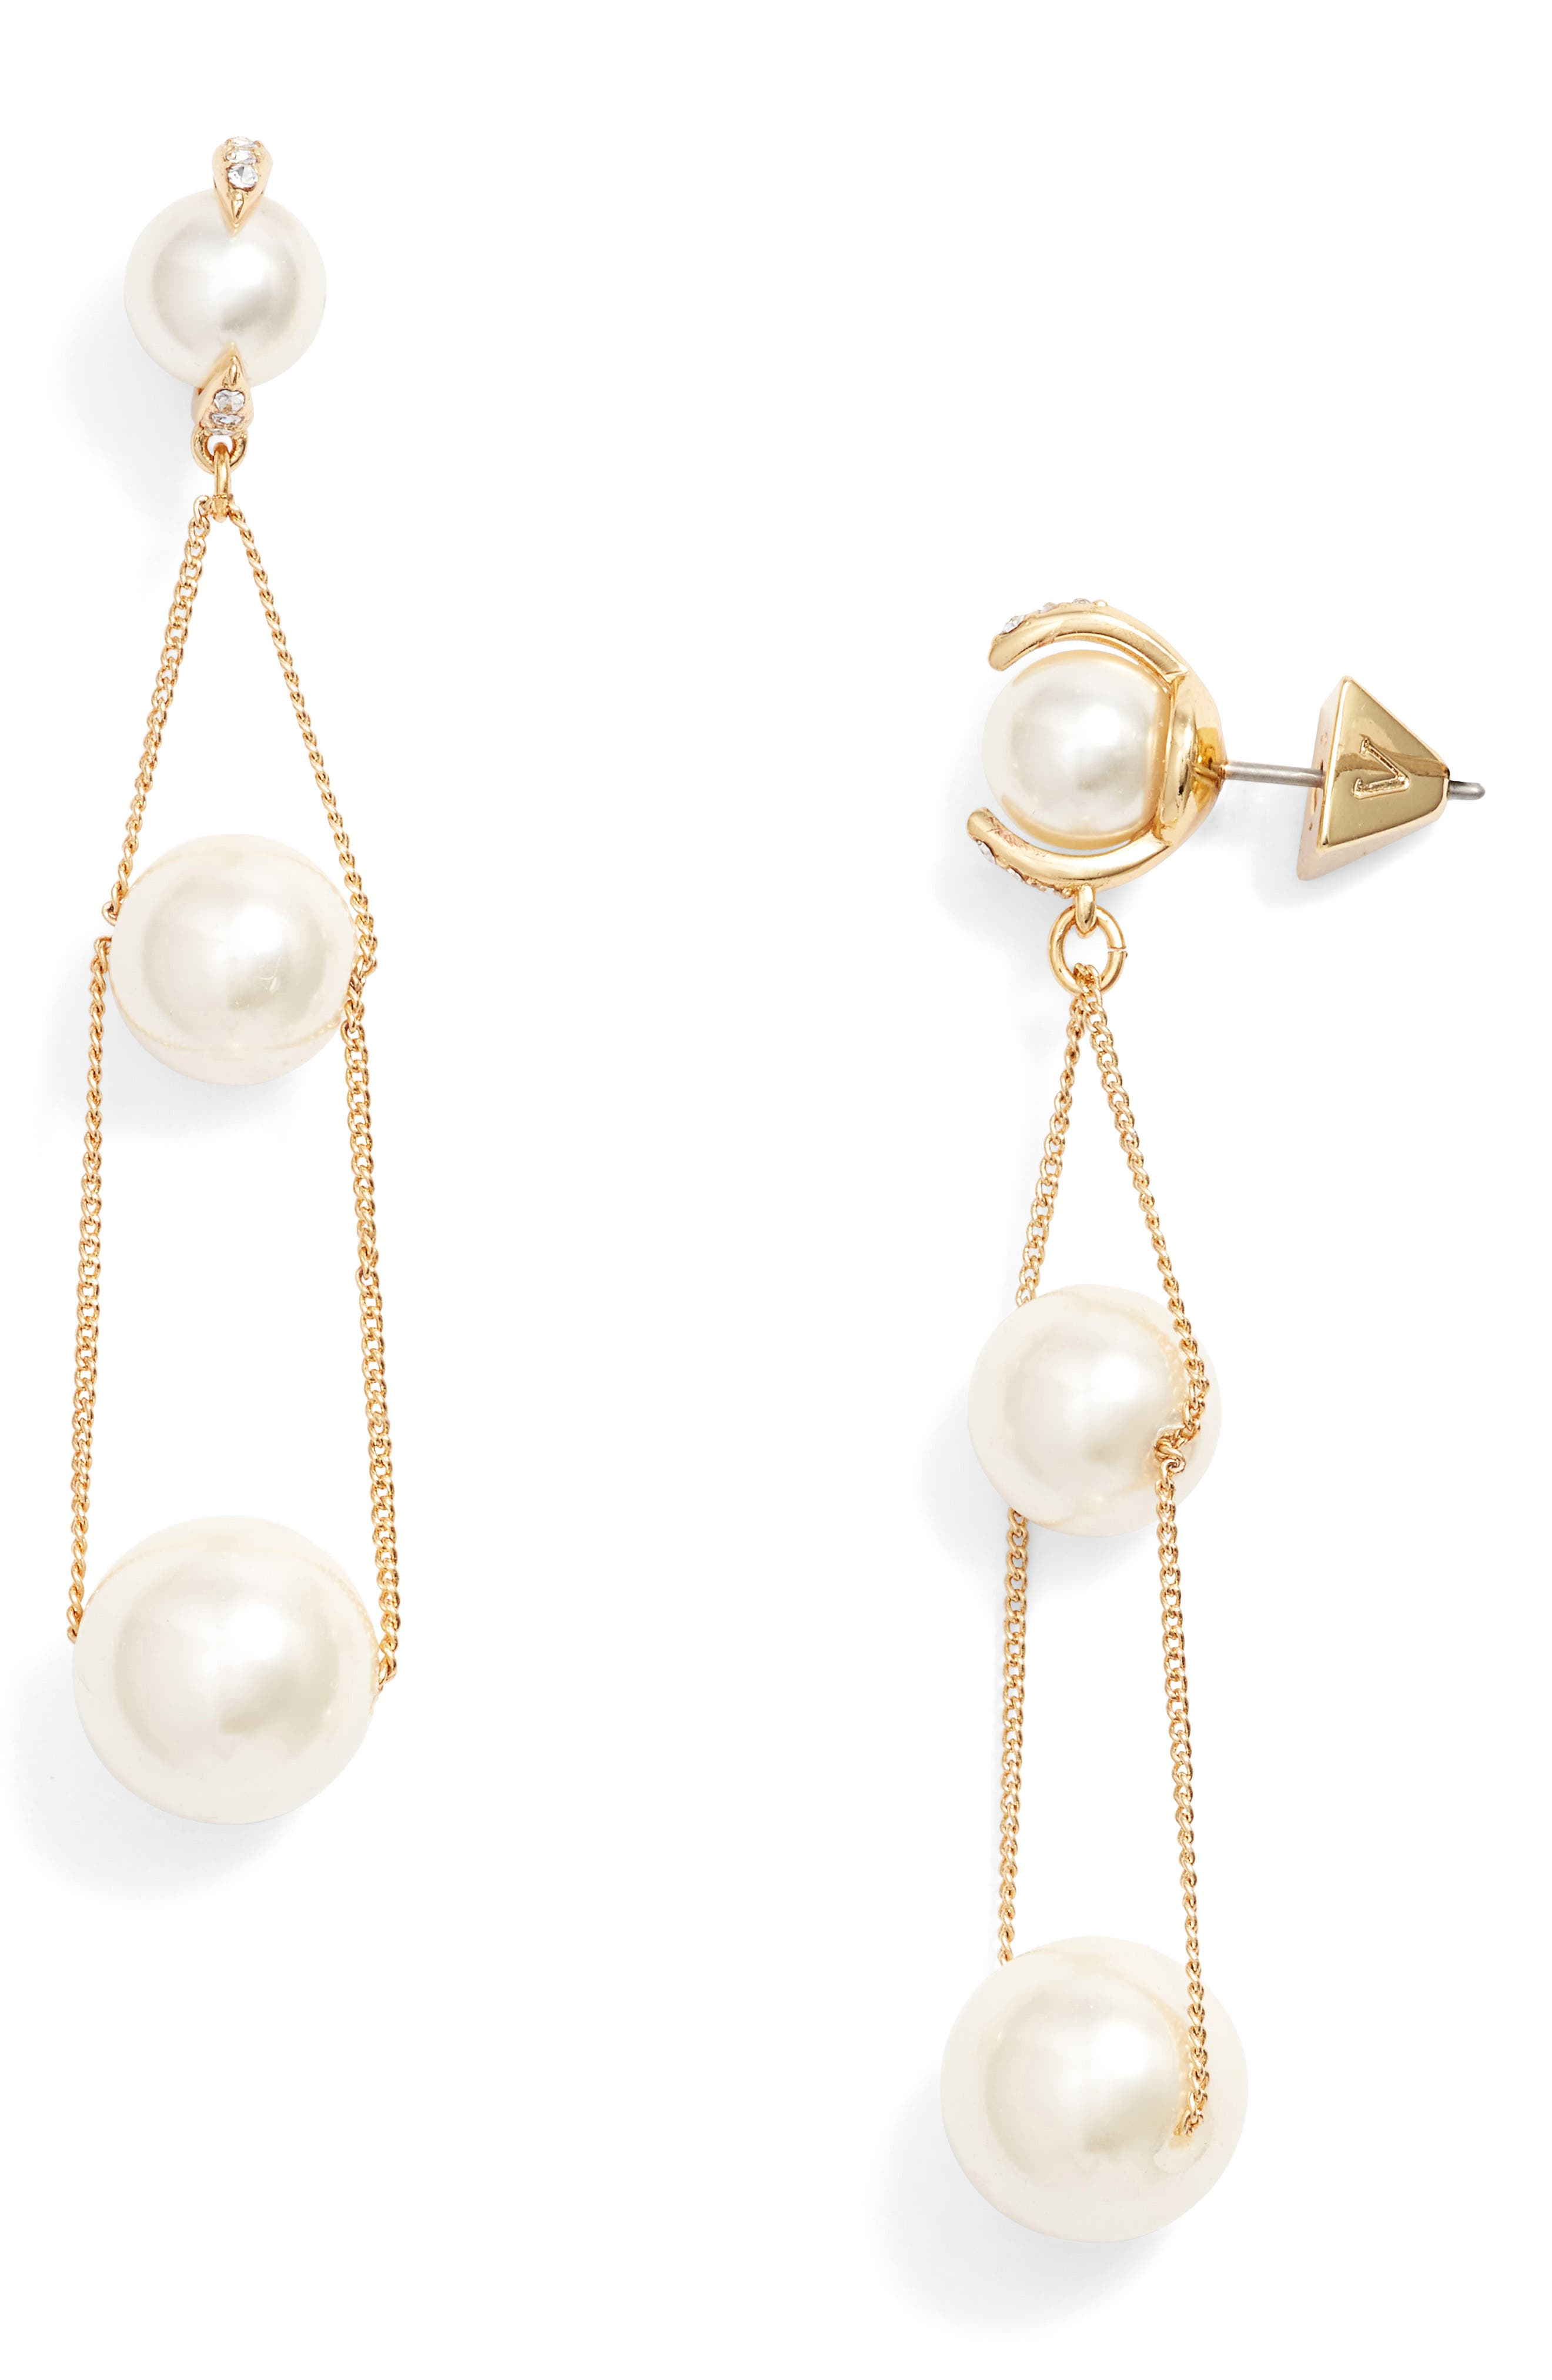 Main Image - Vince Camuto Imitation Pearl Drop Earrings